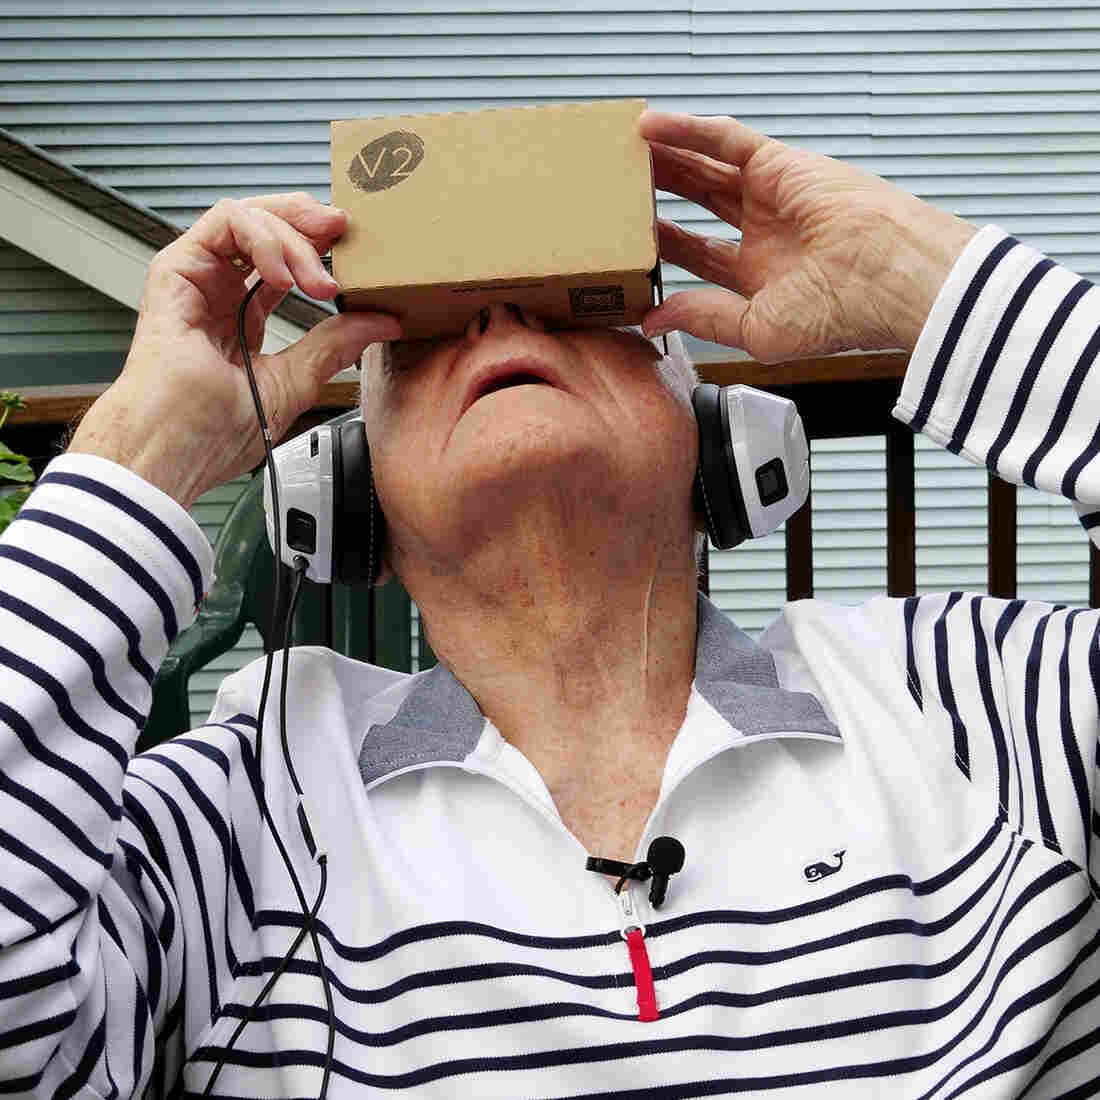 Dale Garrett of Columbia, Mo., a 96-year-old World War II veteran, experiences a trip to a war memorial through virtual reality.